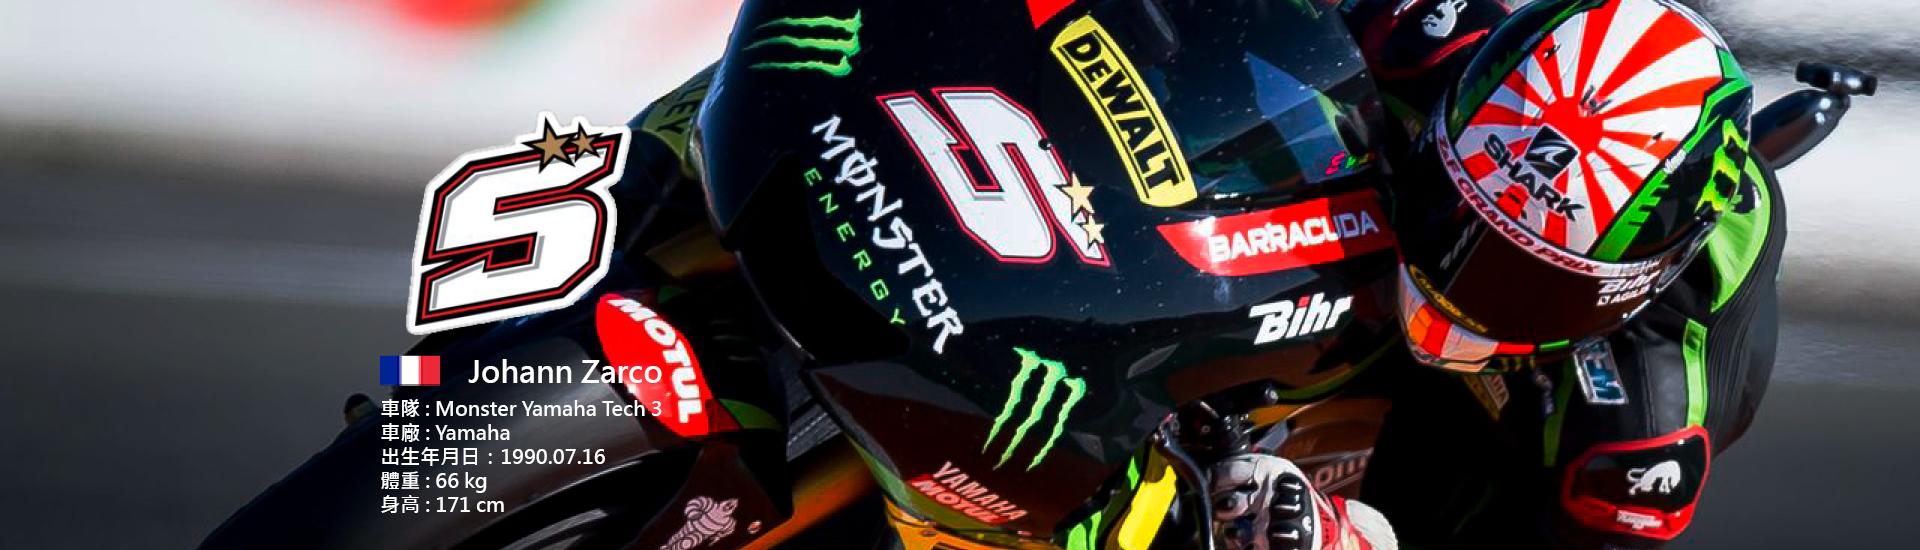 2018 MotoGP 【5】Johann Zarco